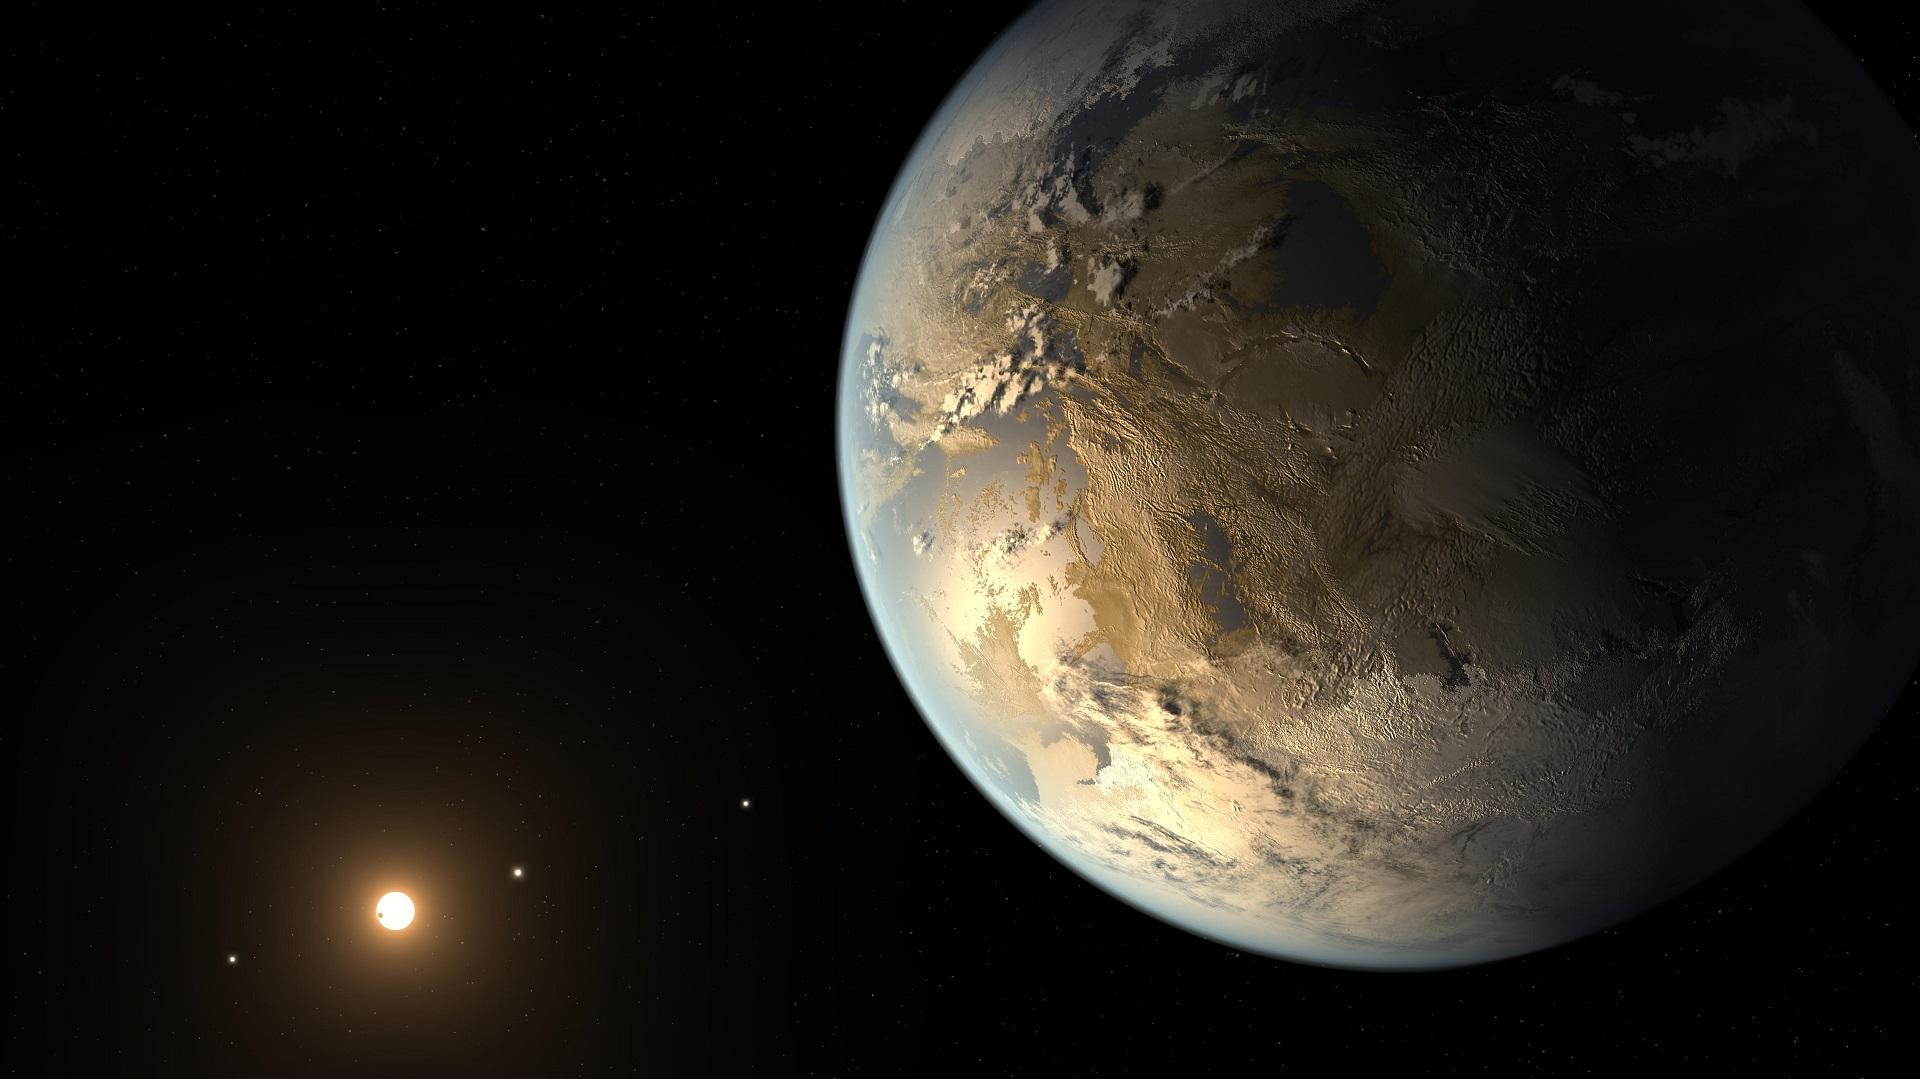 Se confirma: Proxima Centauri tiene su propia Tierra